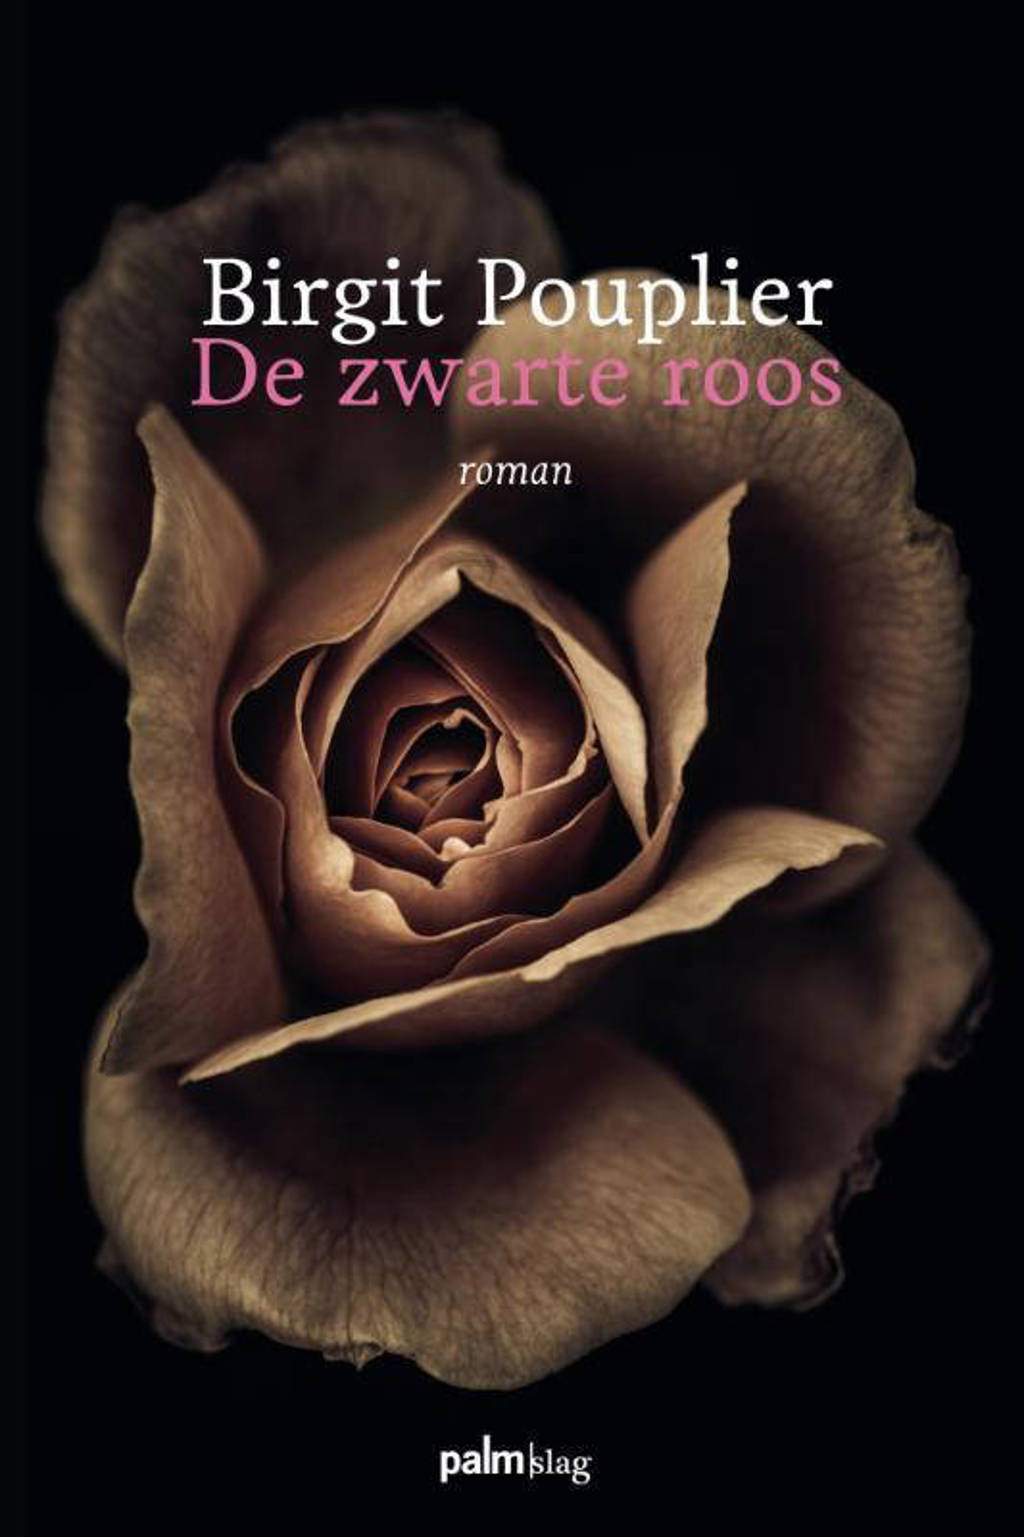 De zwarte roos - Birgit Pouplier